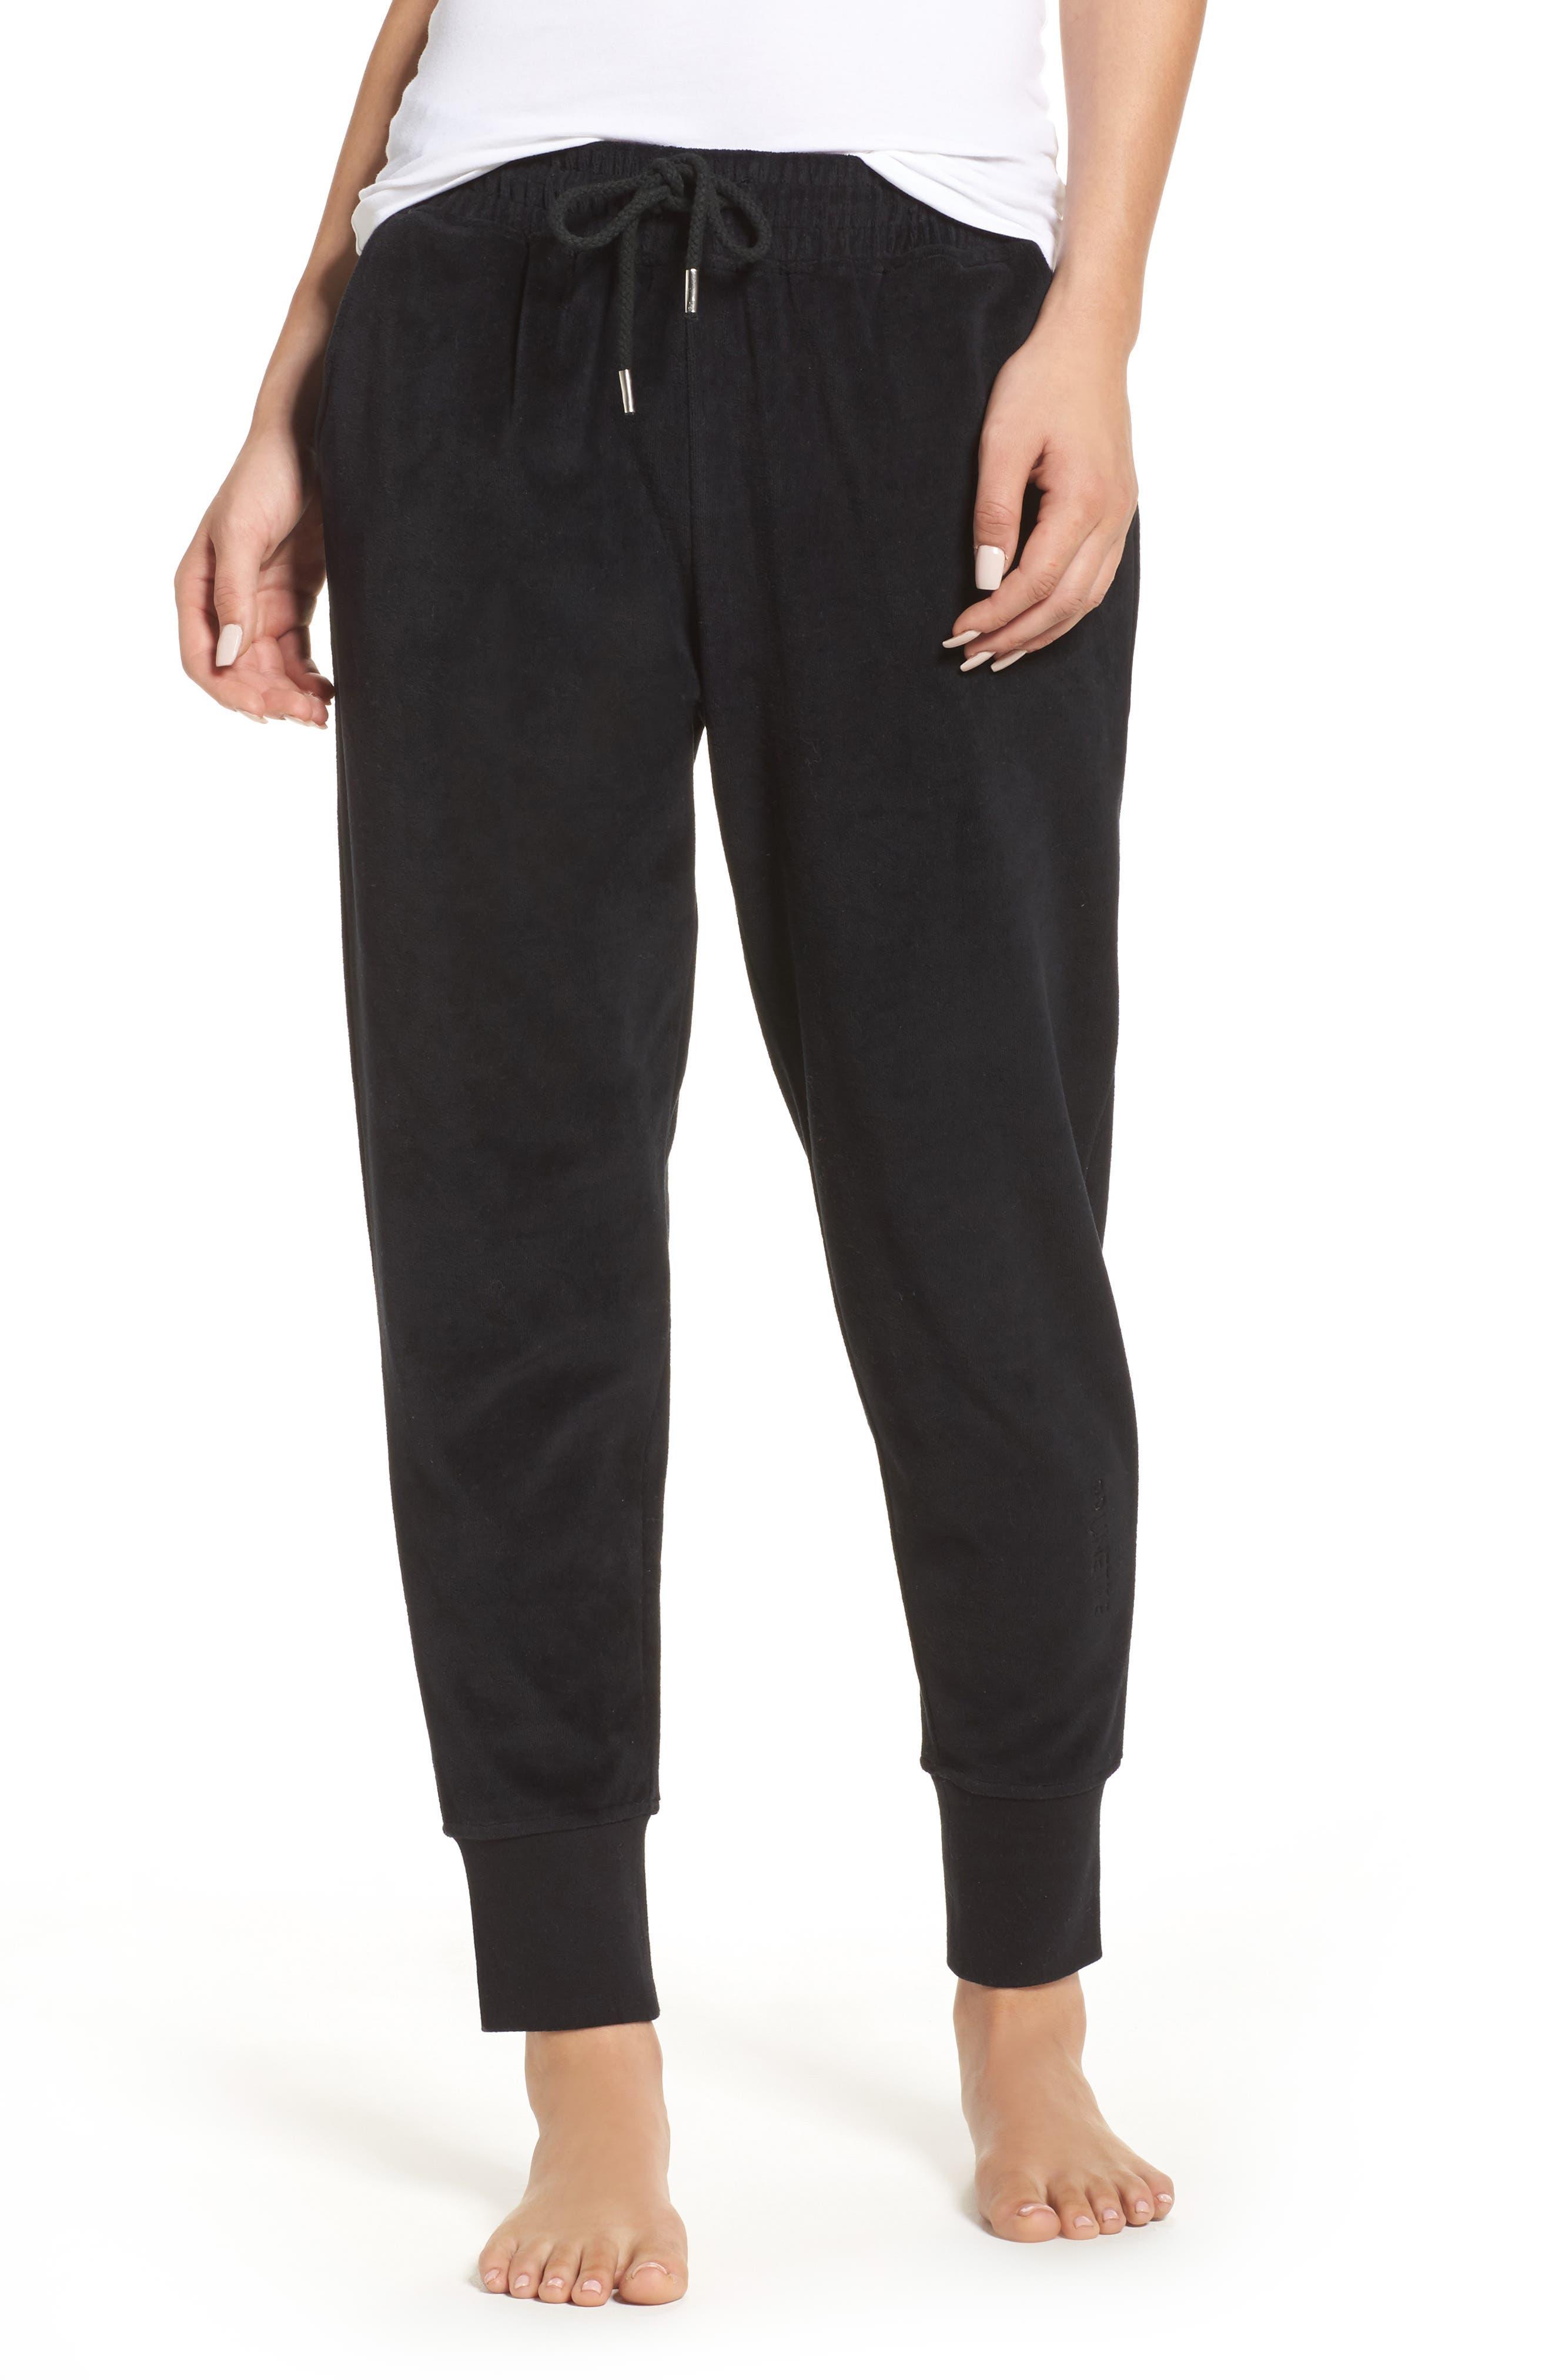 Brunette Embroidered Velour Jogger Pants,                         Main,                         color, Black